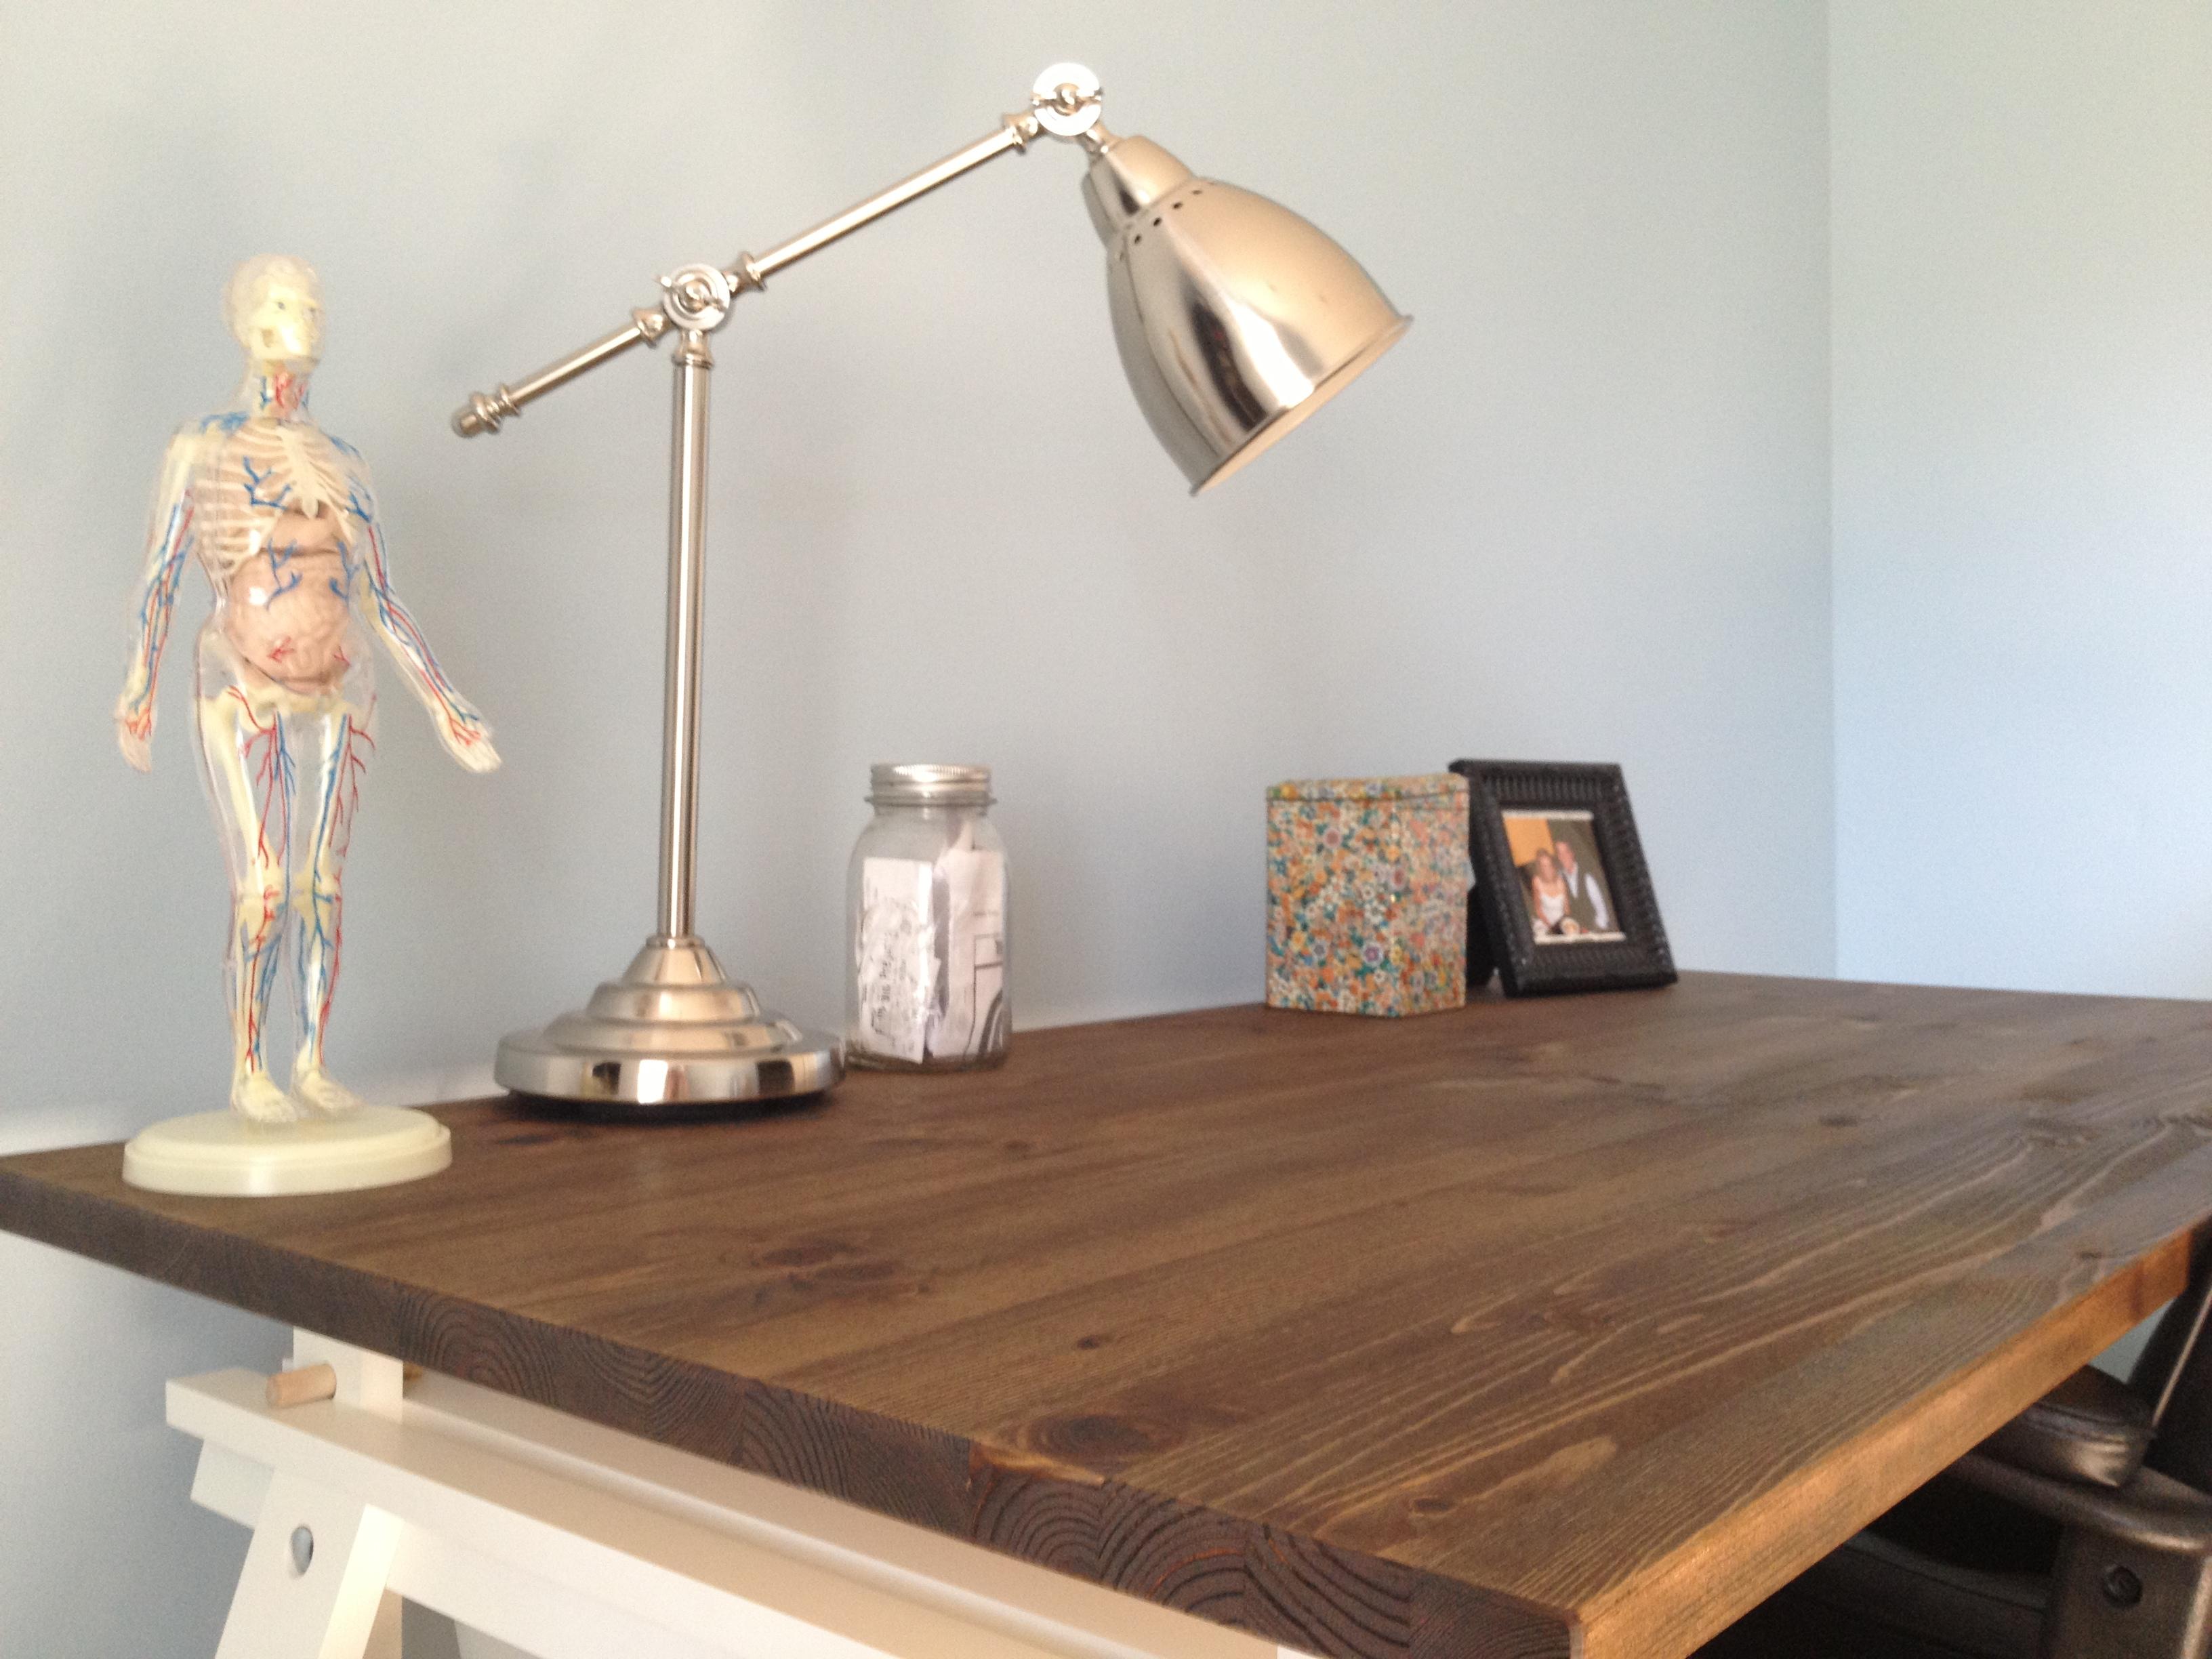 Ikea Desk Tutorial | All Things New Interiors